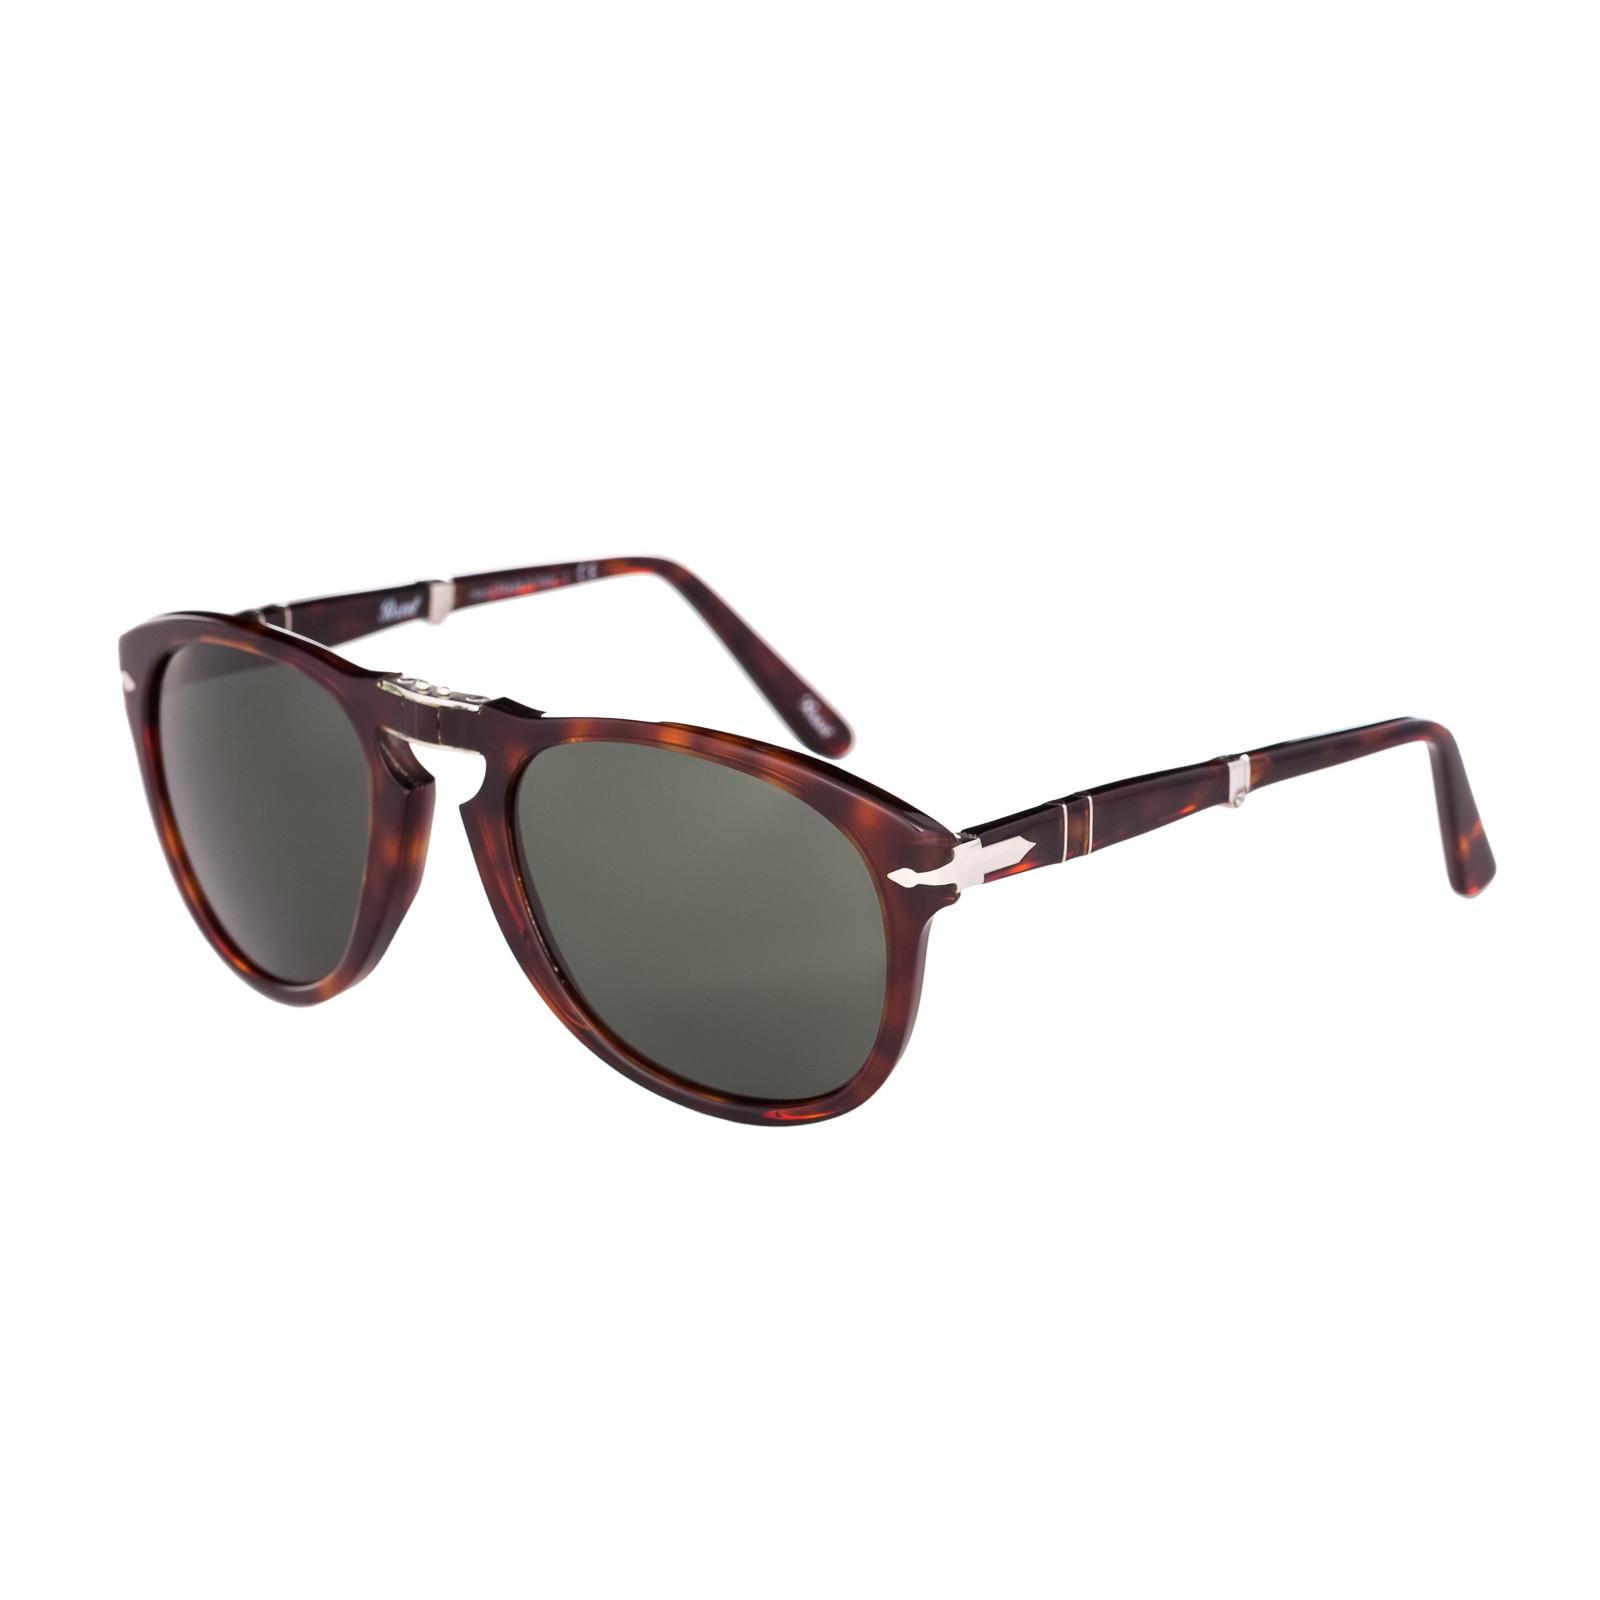 d8b2e2ca20f Persol Folding Havana Sunglasses PO0714 24 31 - Sunglasses